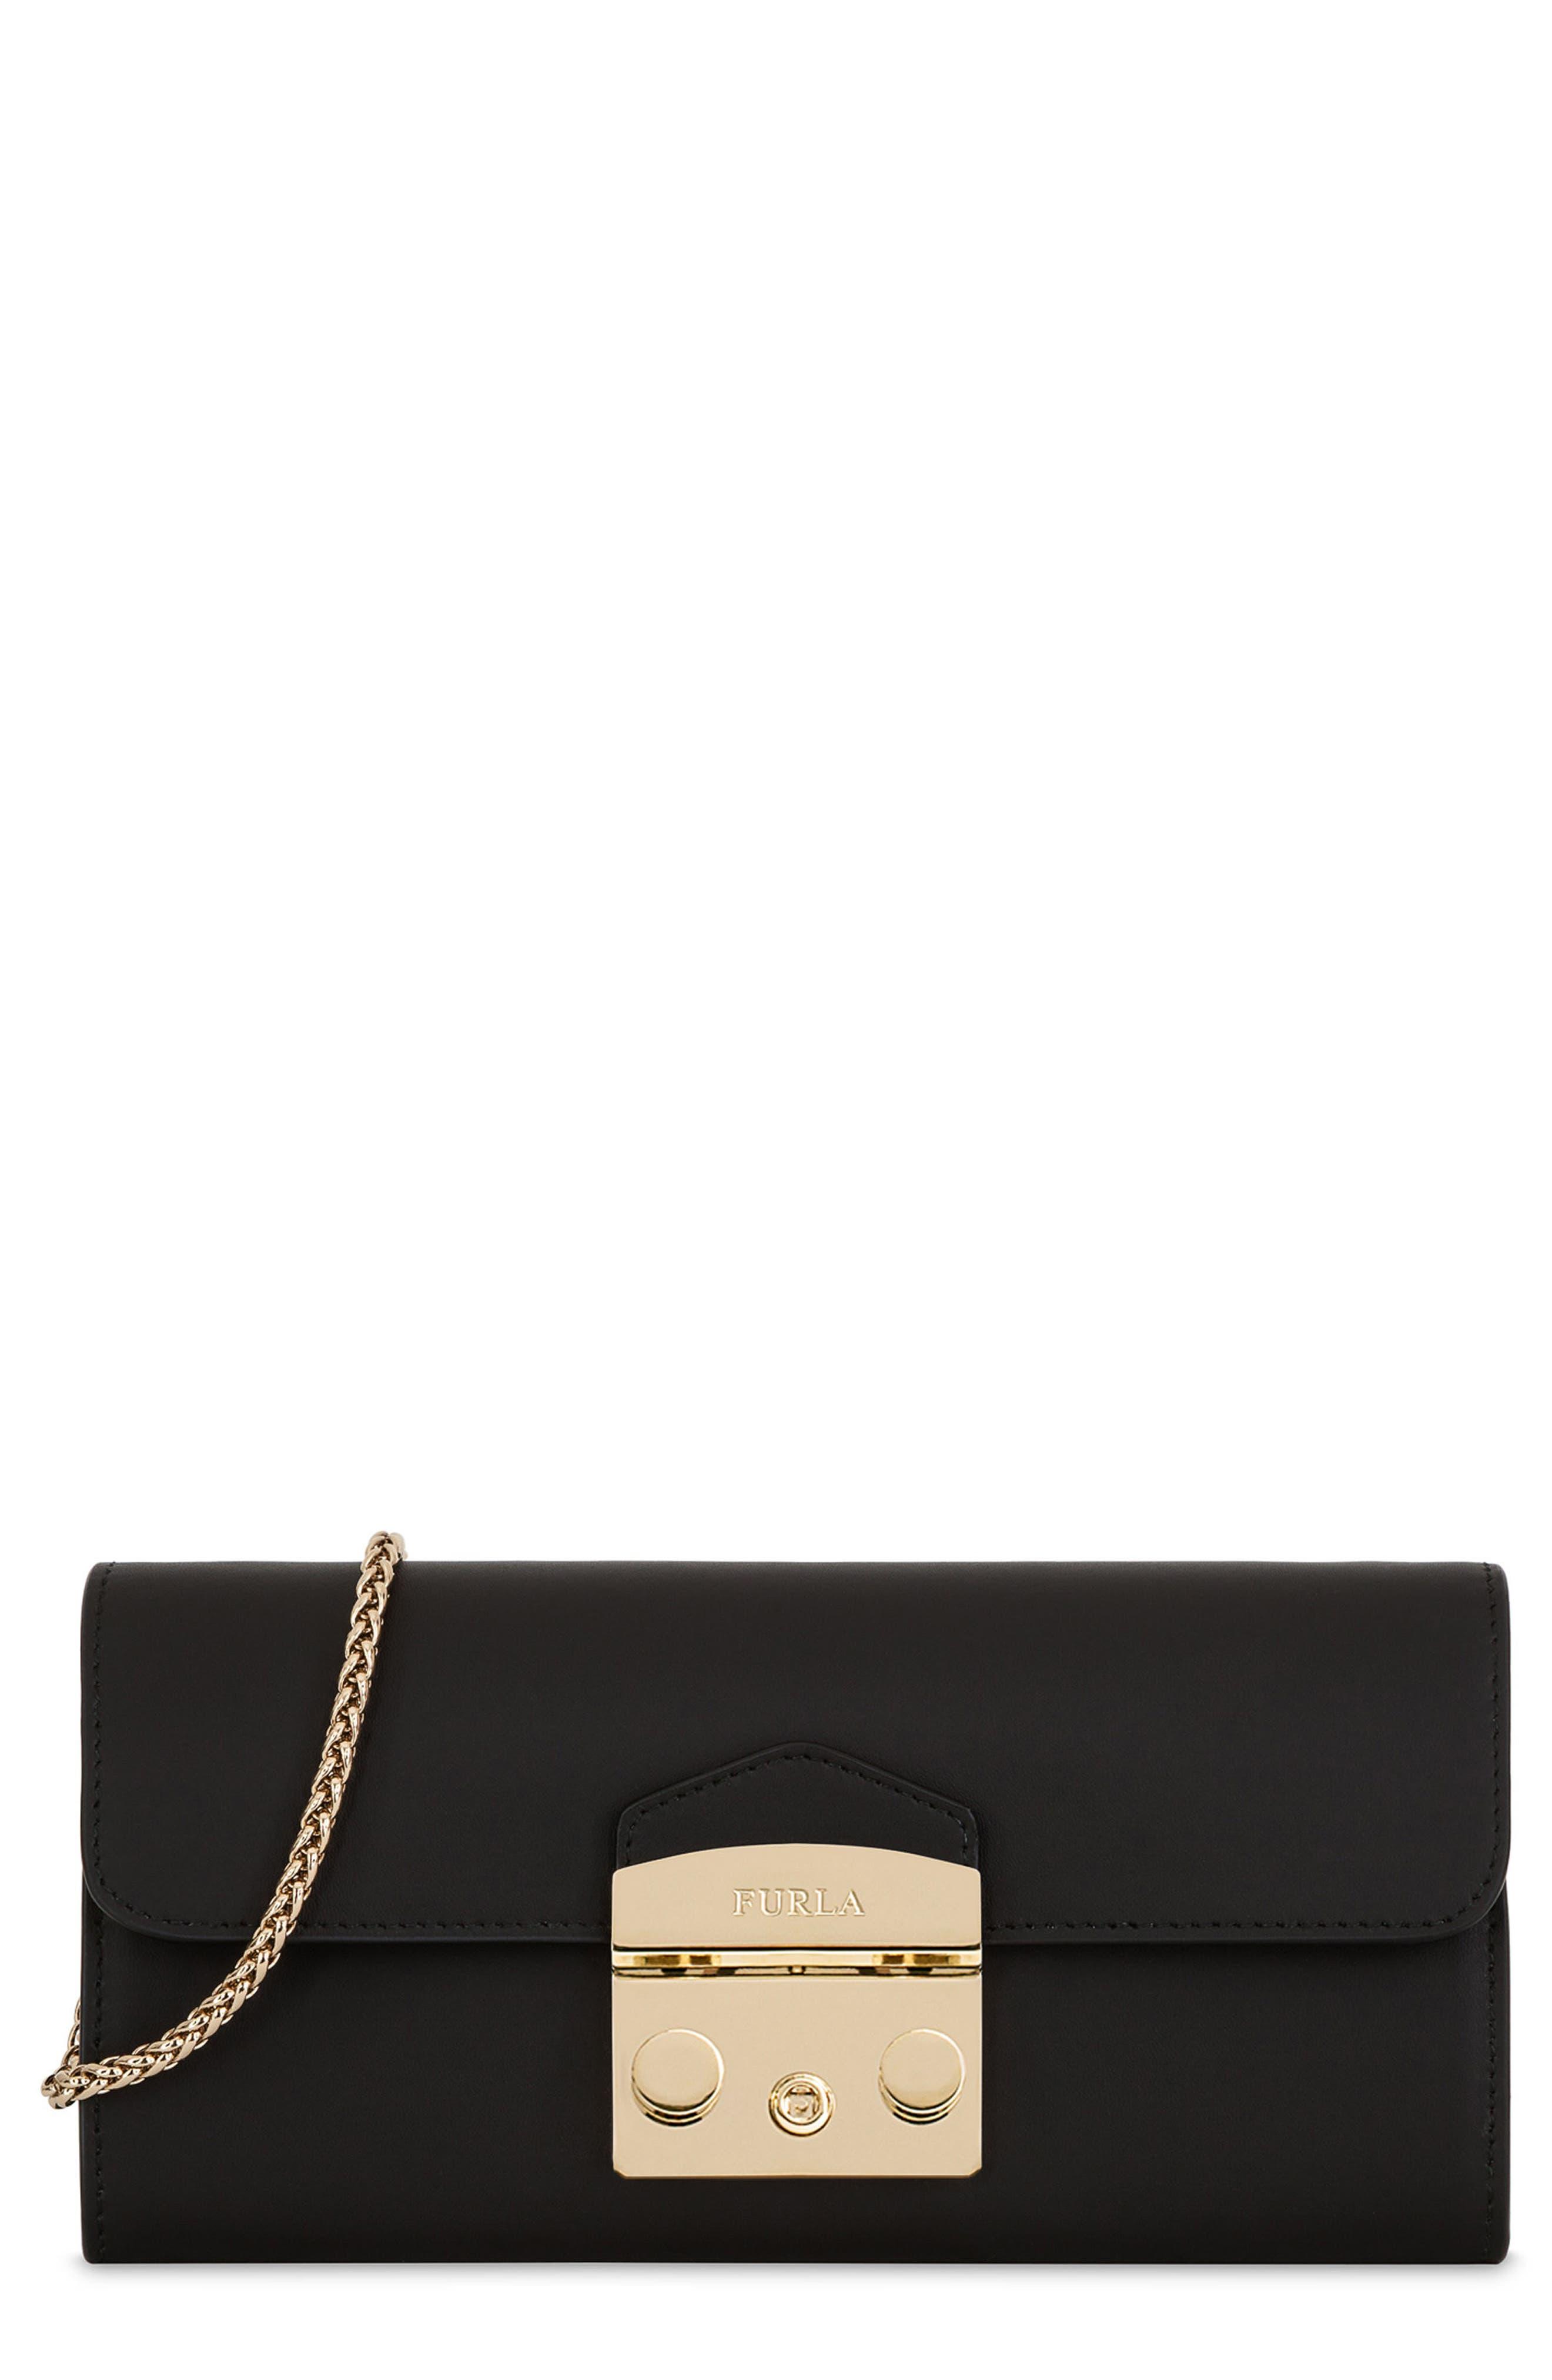 Furla Metropolis Leather Wallet on a Chain